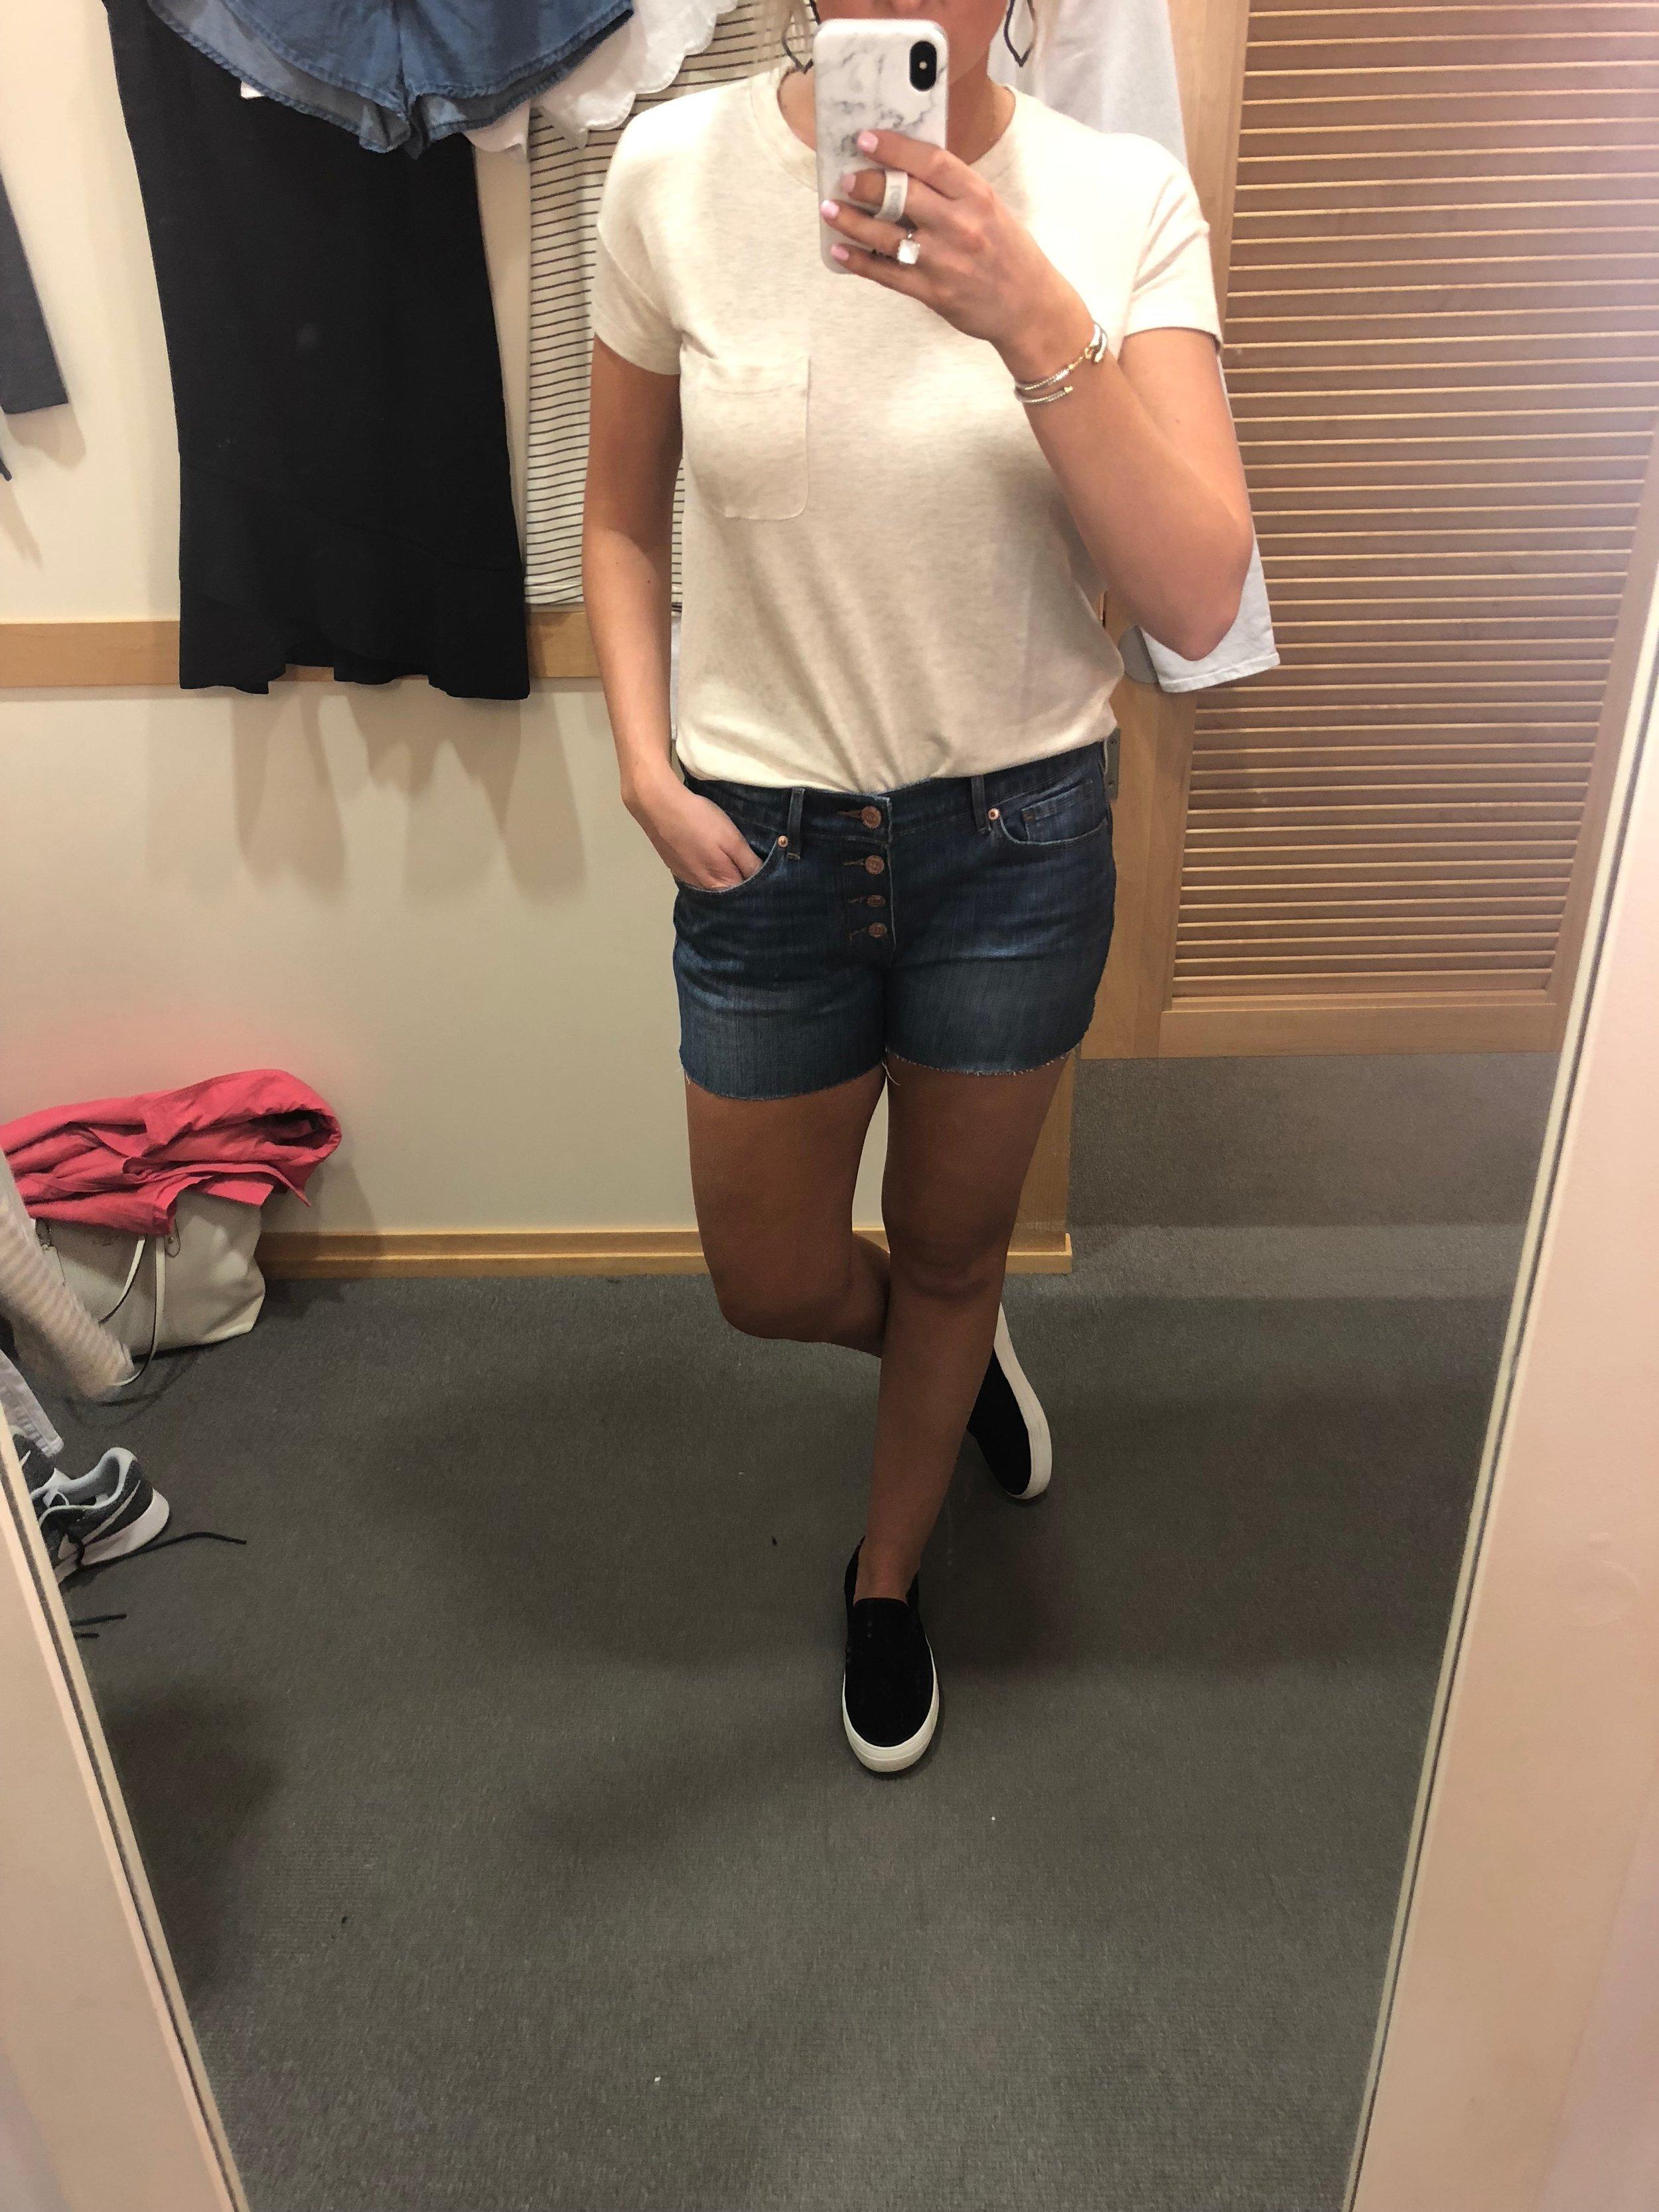 Shorts-M $32 Shirt-XS $30